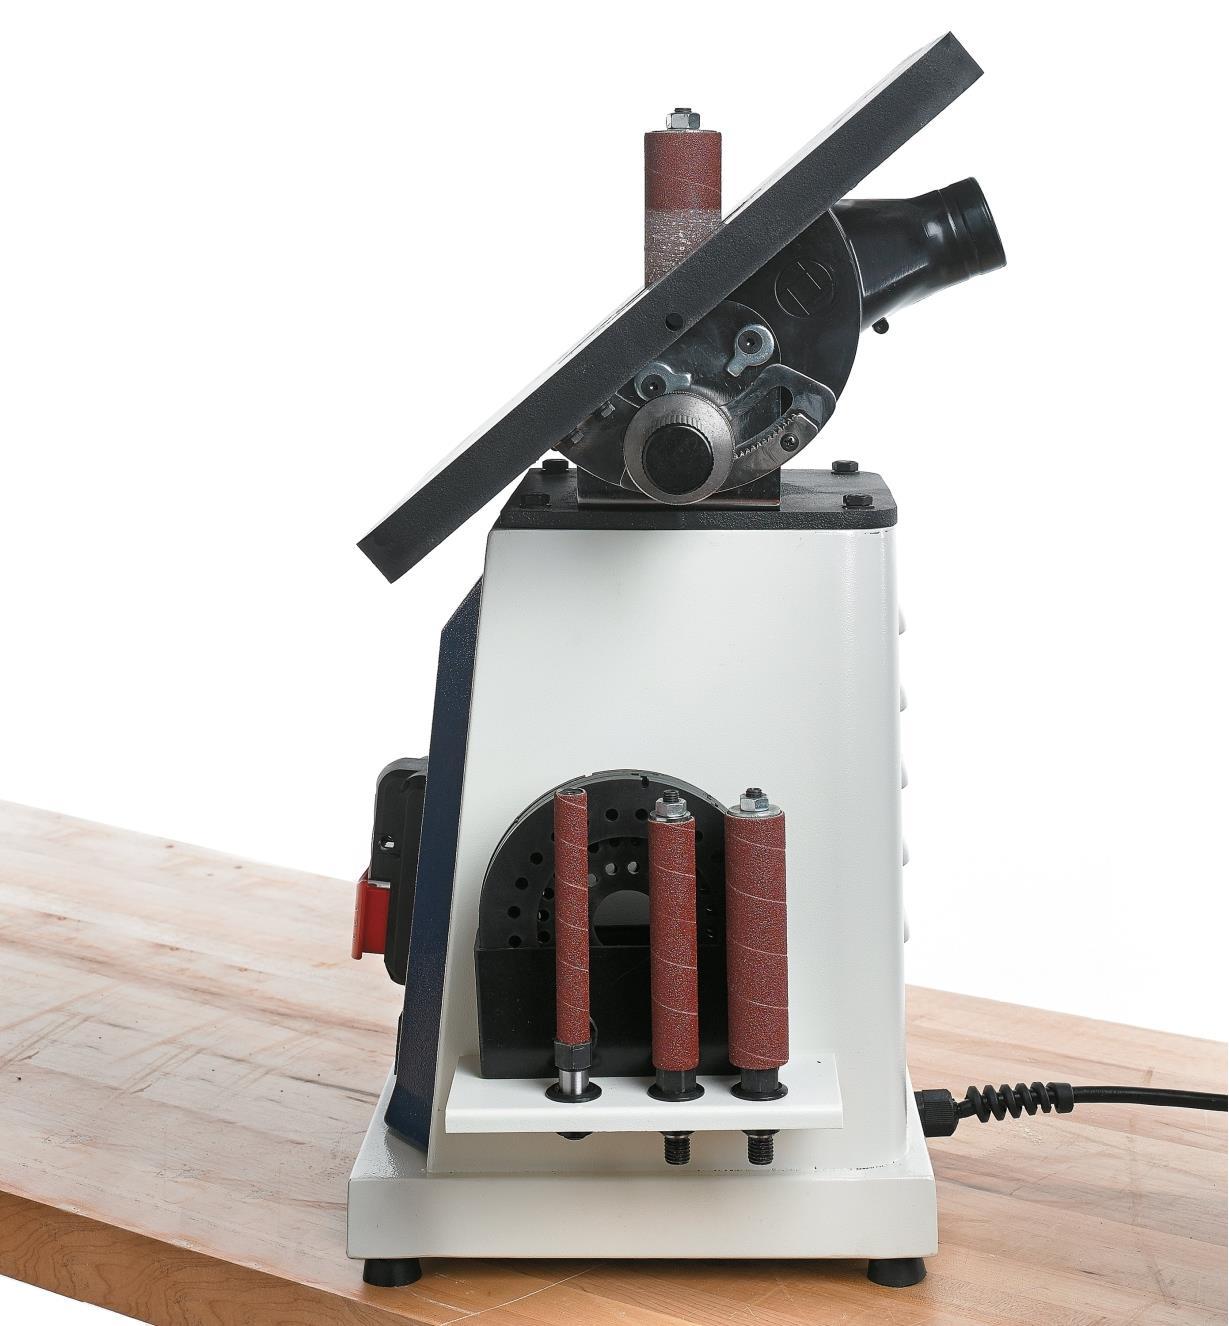 Table on the Rikon Oscillating Spindle Sander tilted 45°